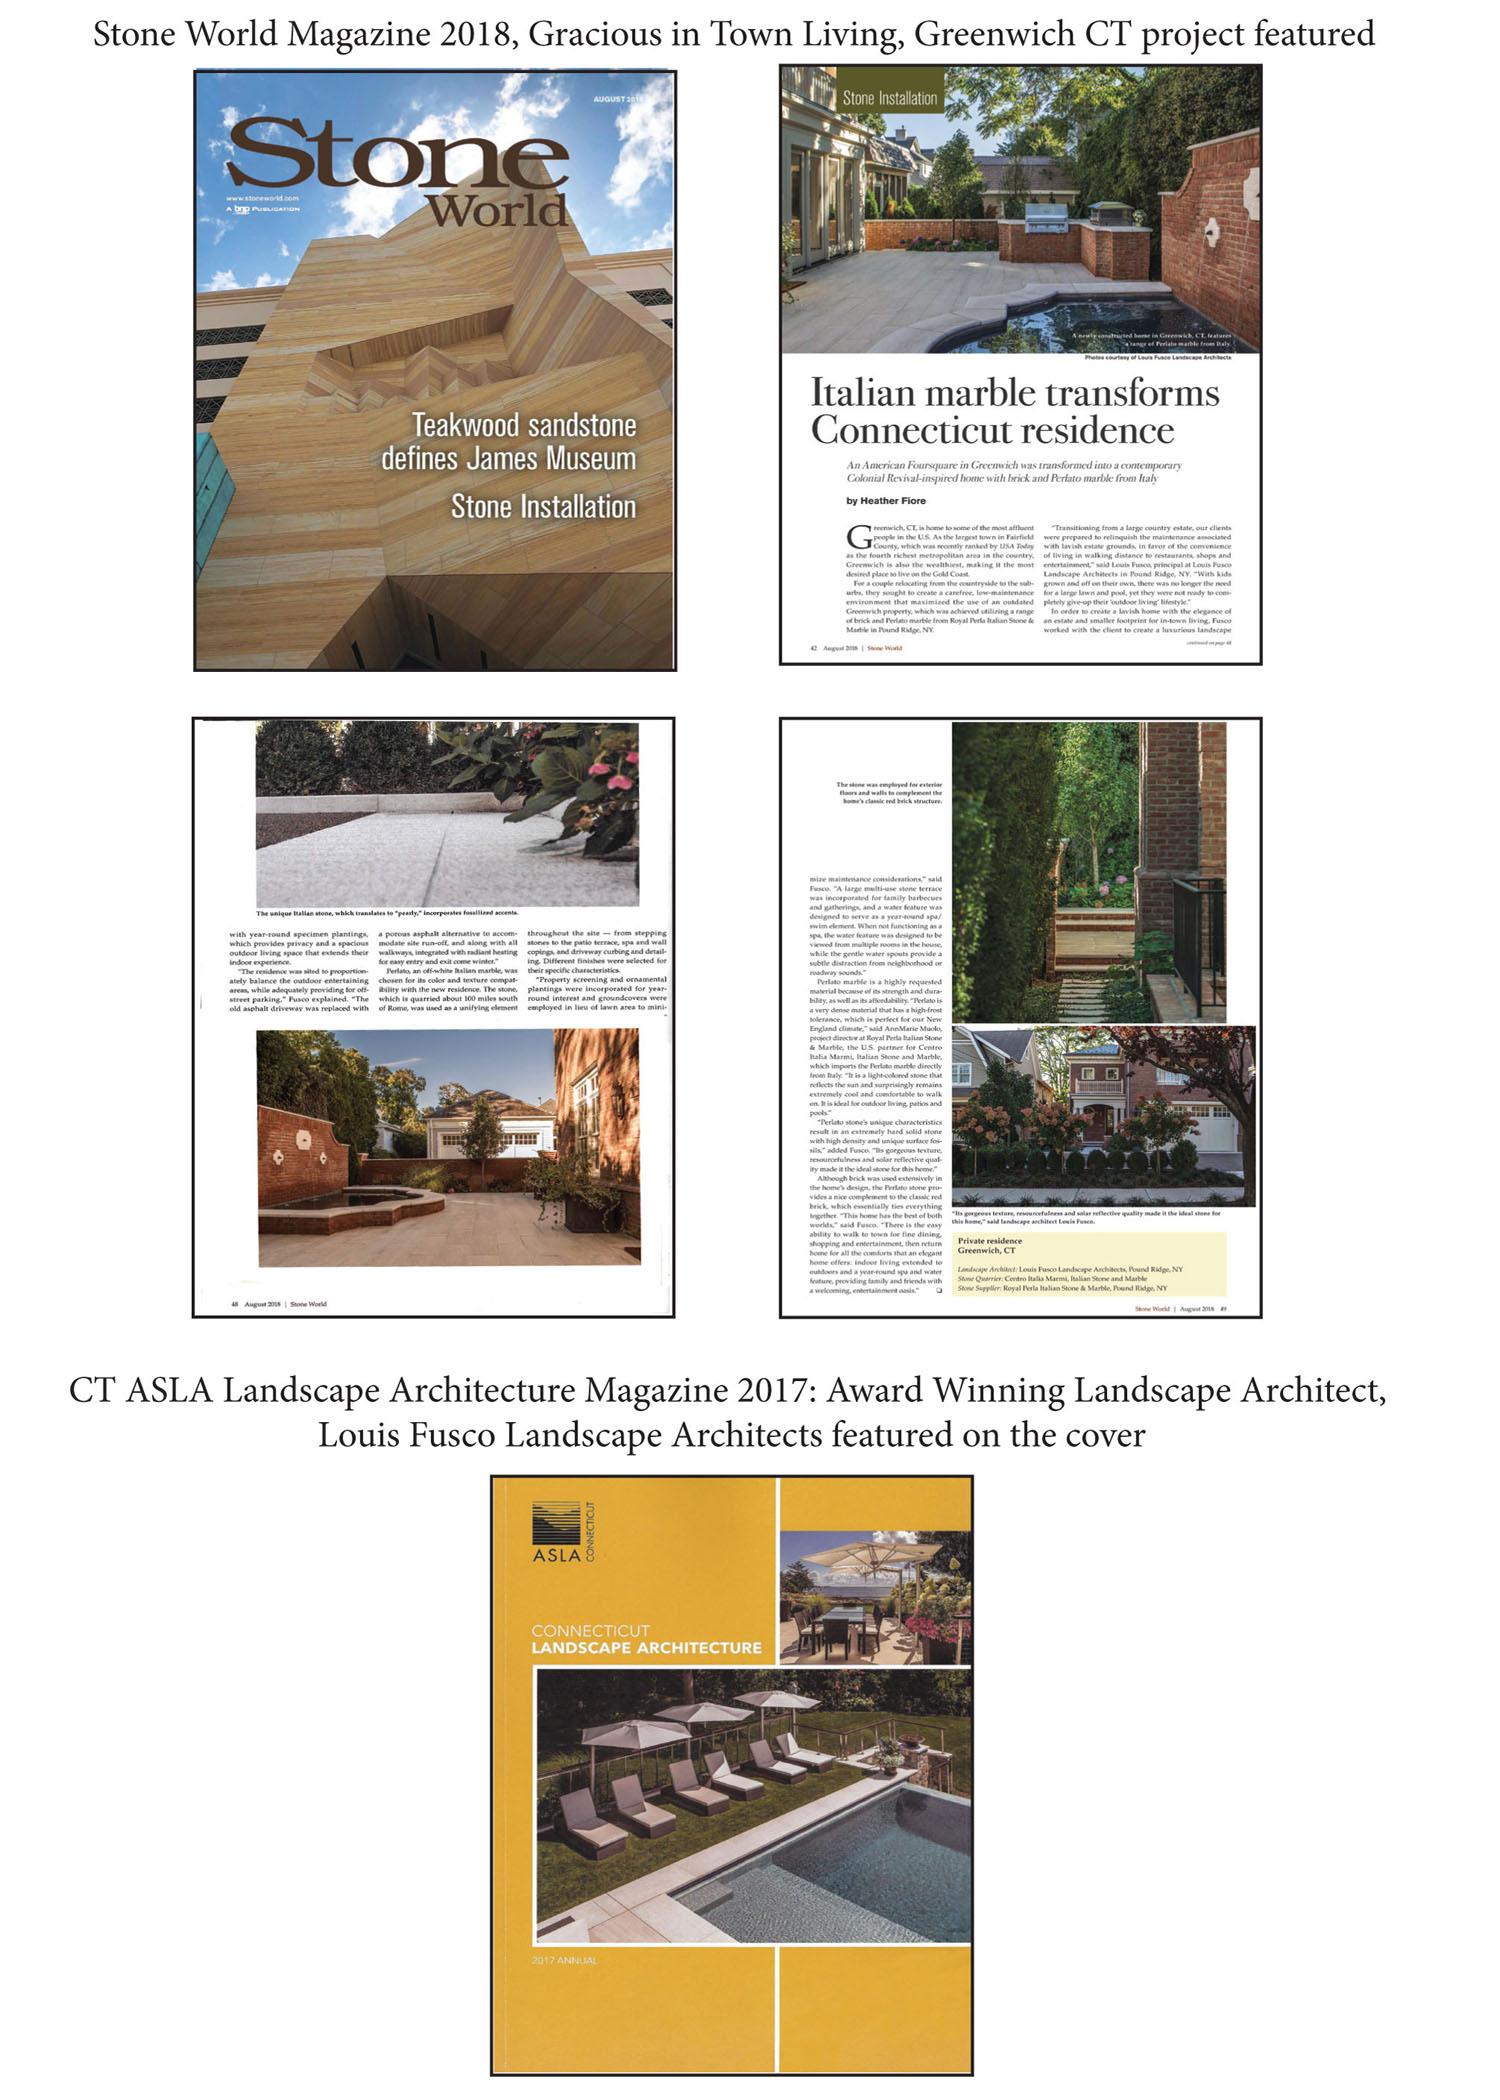 LF_Publications_5_20_19